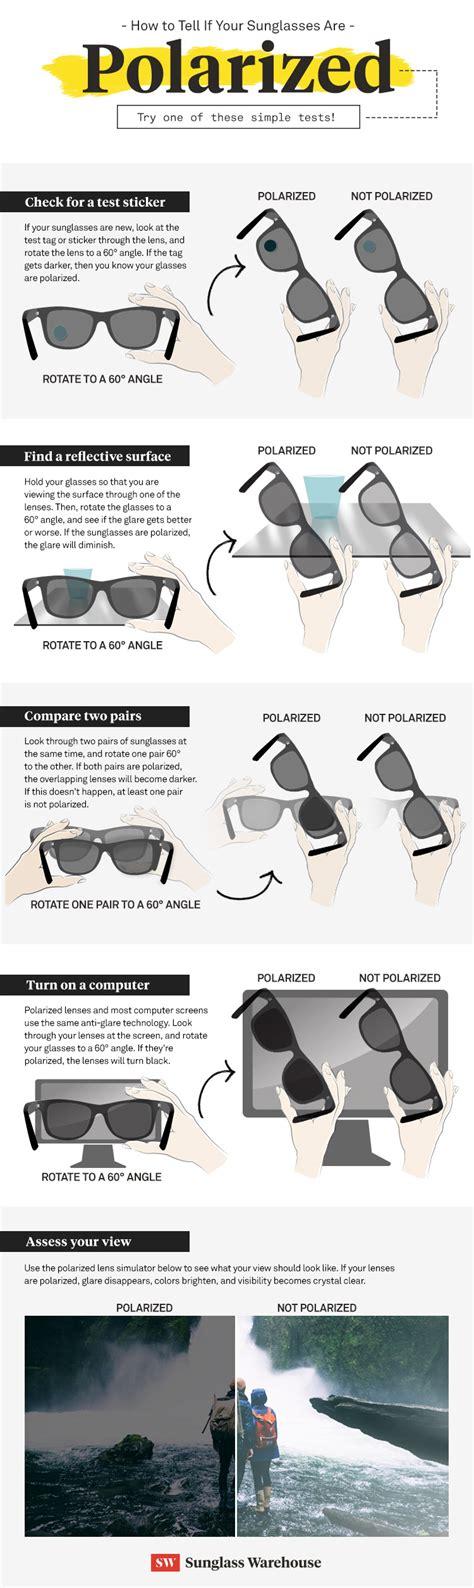 Polarized Sunglasses Test  Sunglass Warehouse